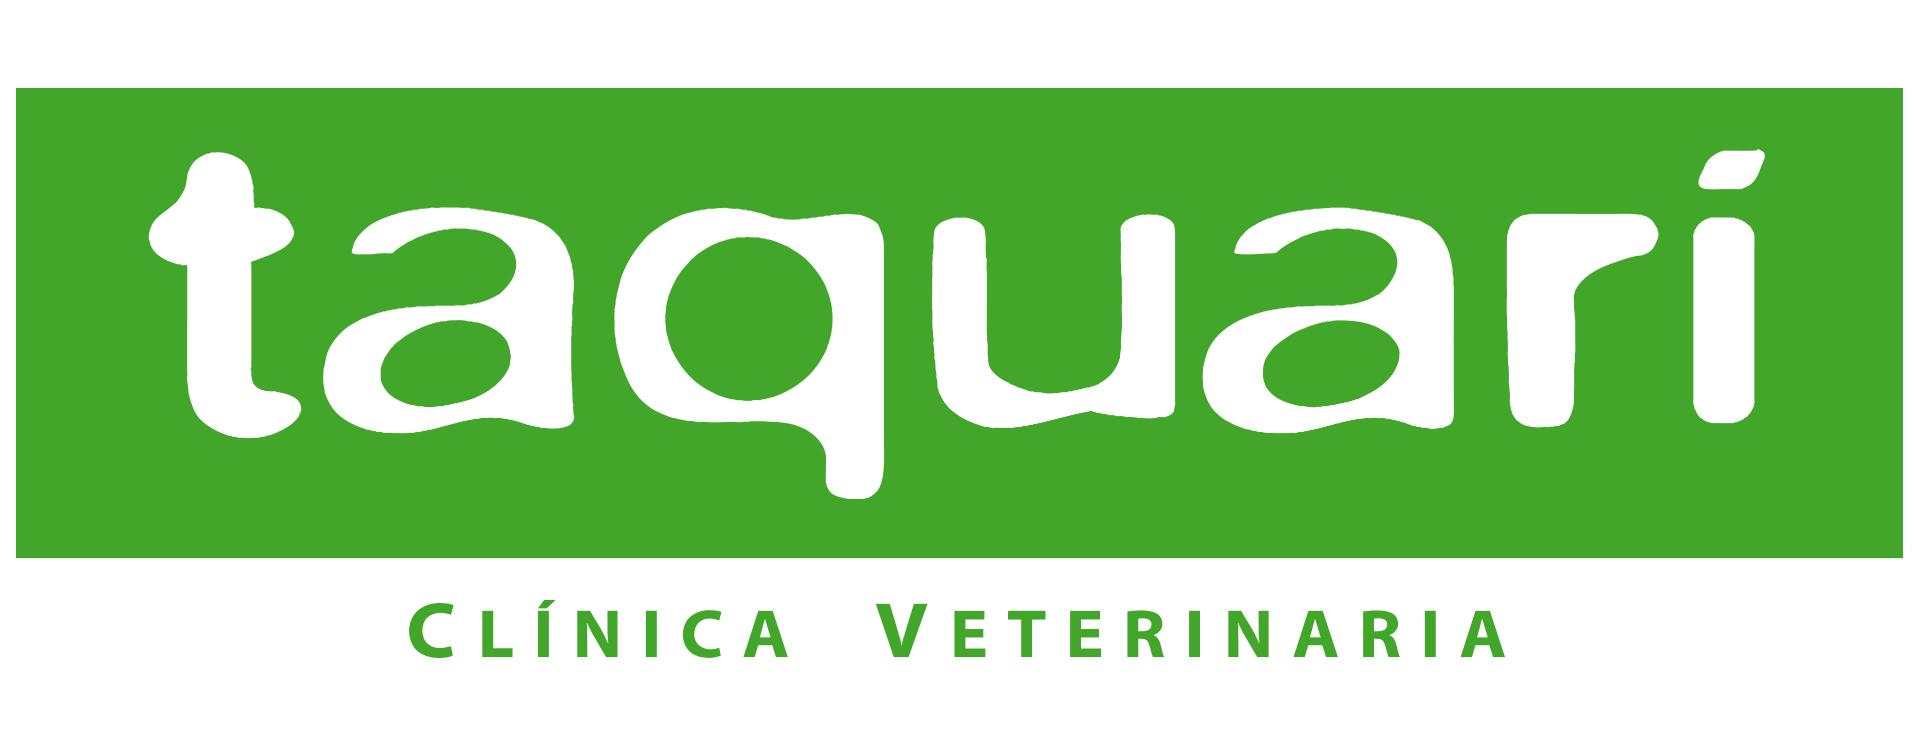 Clinicas Veterinarias en Barcelona Taquarí